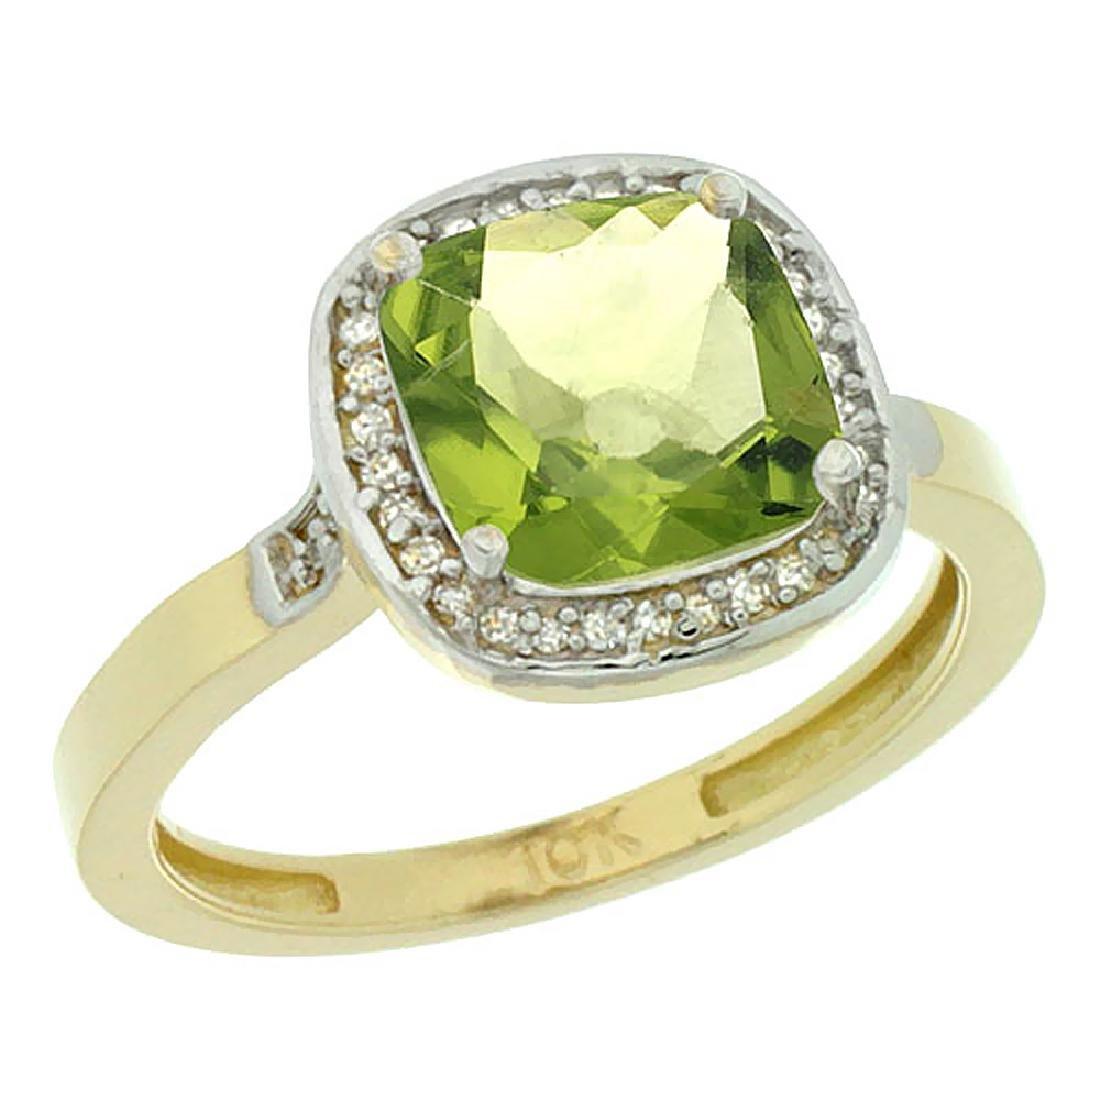 Natural 3.94 ctw Peridot & Diamond Engagement Ring 14K